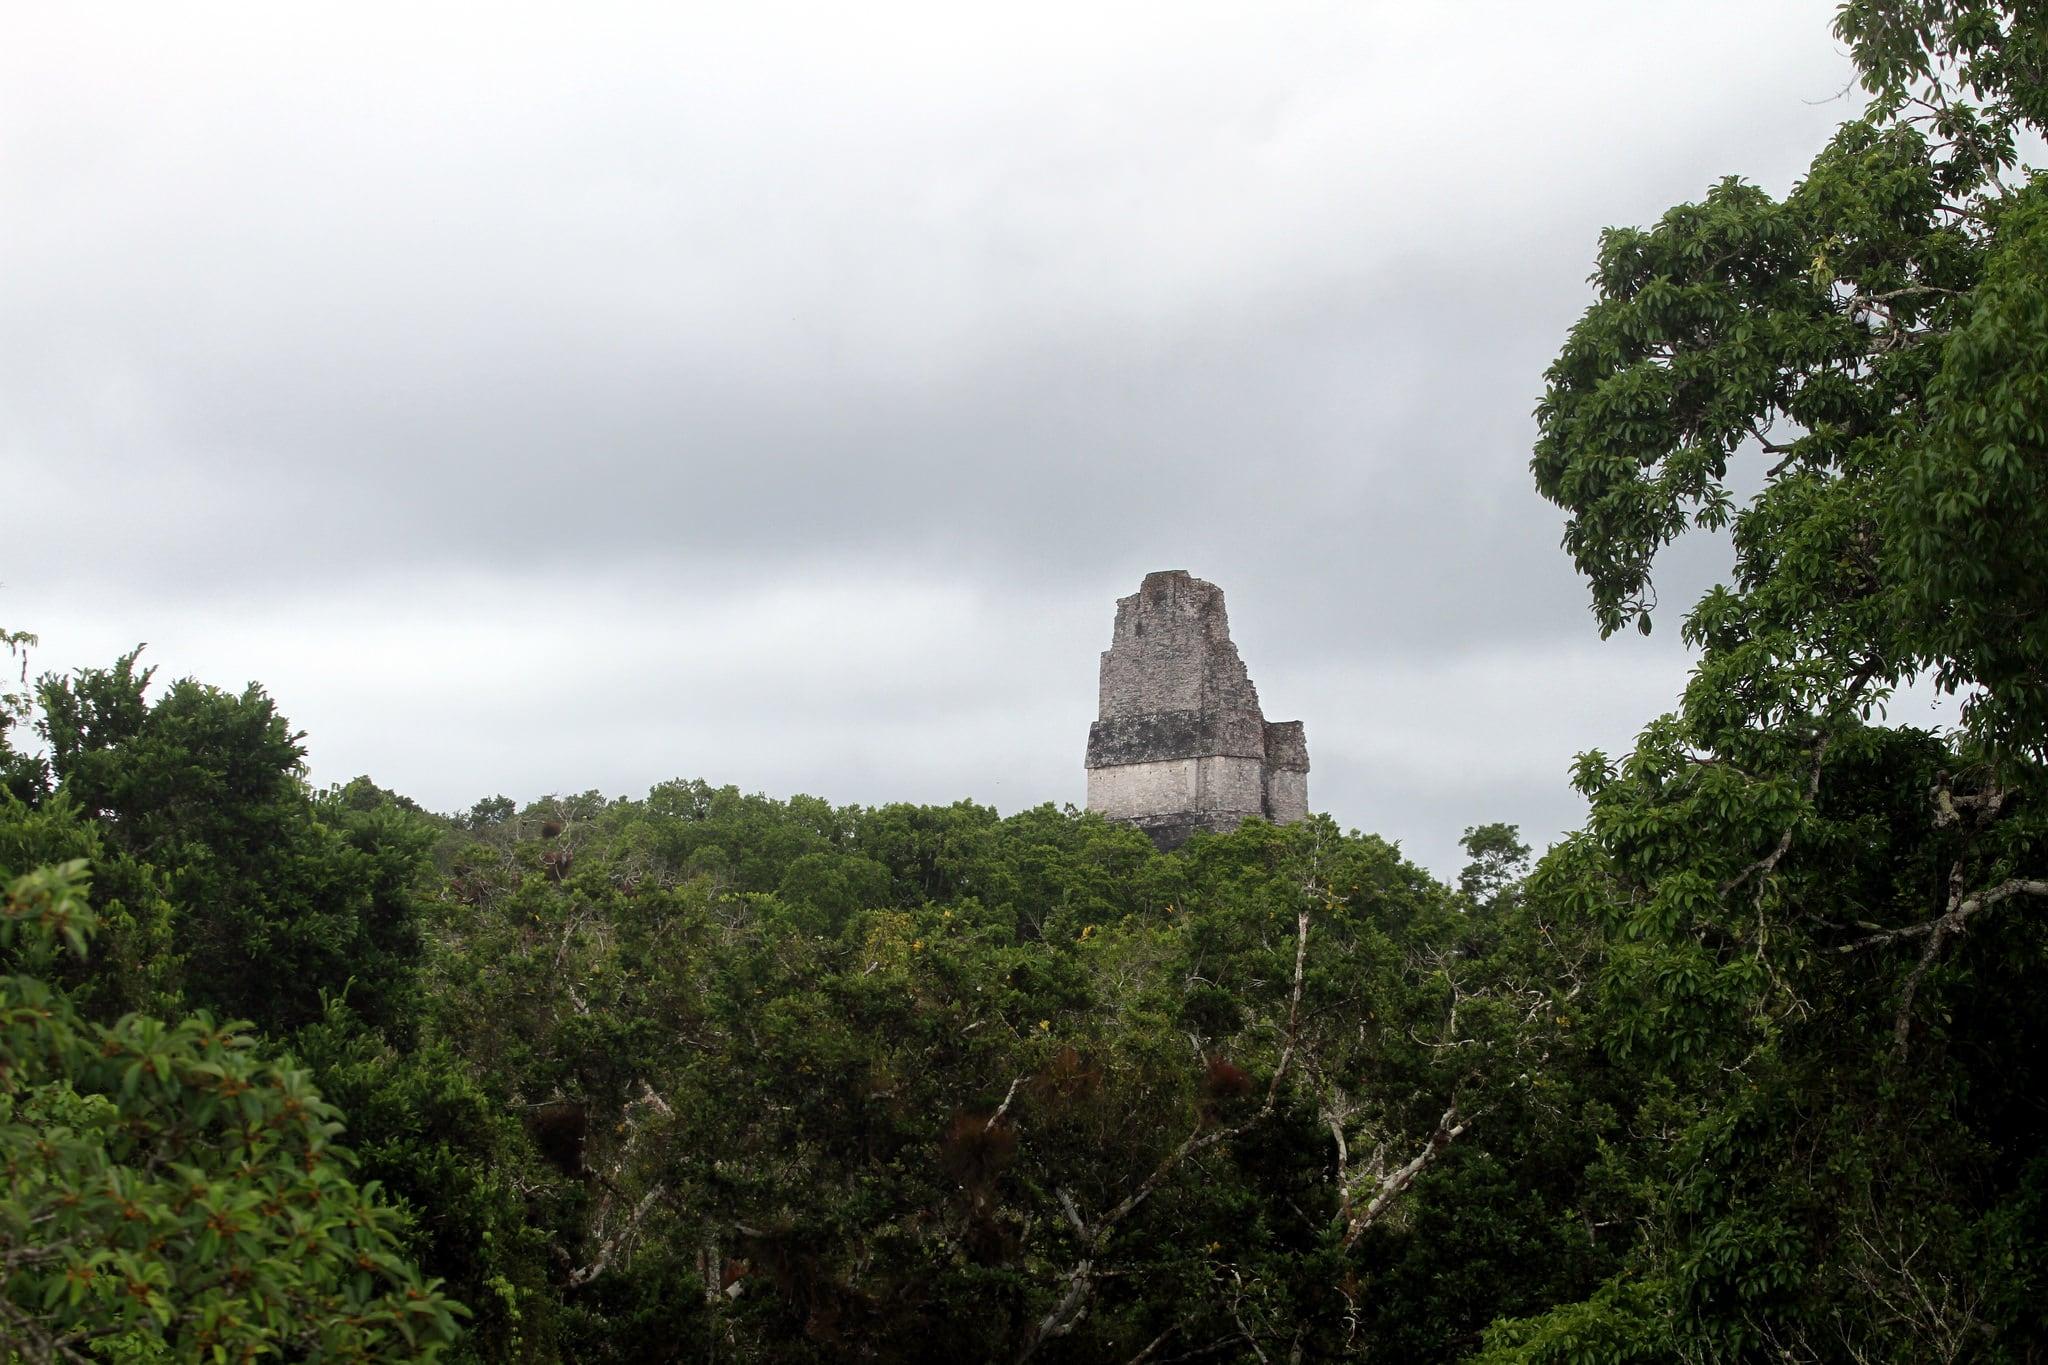 Tikal 在 Tikal 附近 的形象.